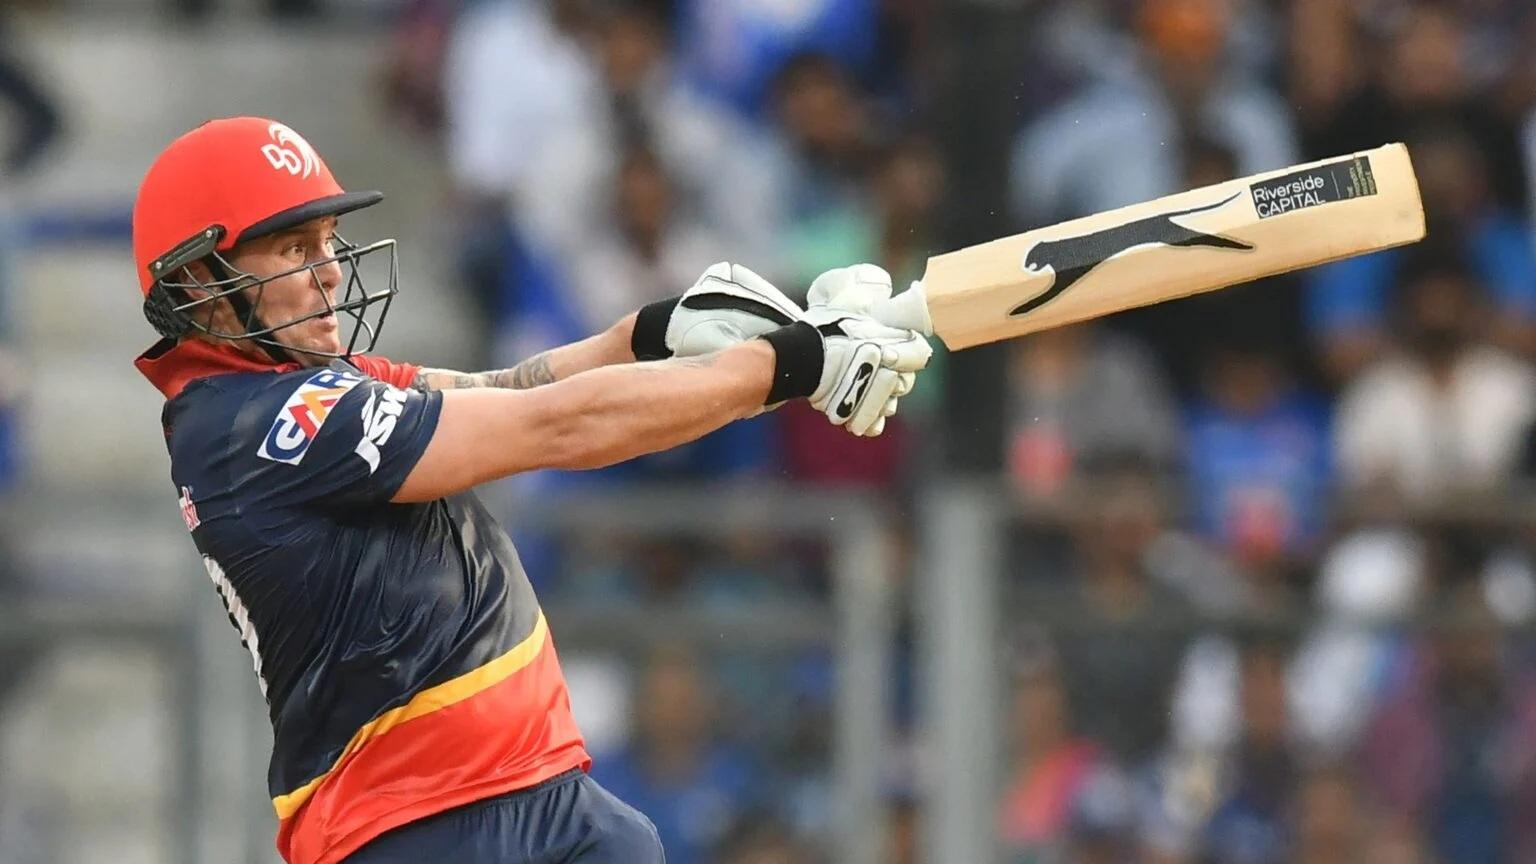 IPL 2021: মিচেল মার্শের আইপিএল থেকে ছিটকে যাওয়ার পর এই খেলোয়াড় নিতে পারেন হায়দ্রাবাদে তার জায়গা 2